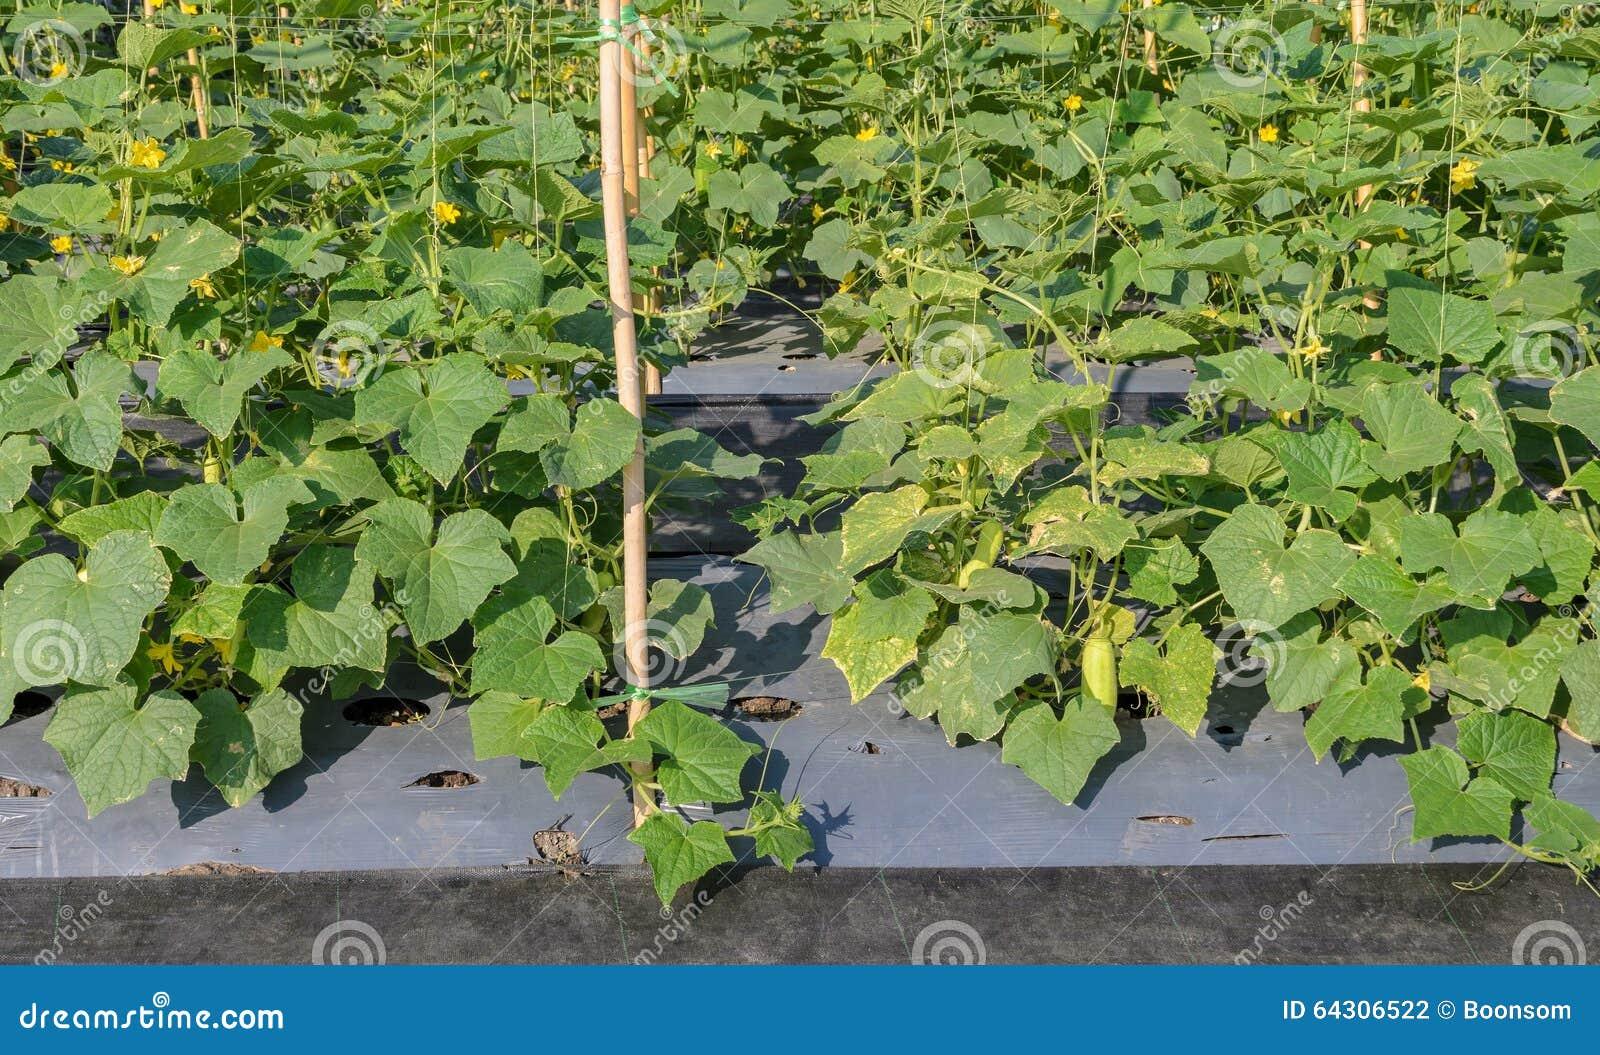 plantation de concombre photo stock image 64306522. Black Bedroom Furniture Sets. Home Design Ideas